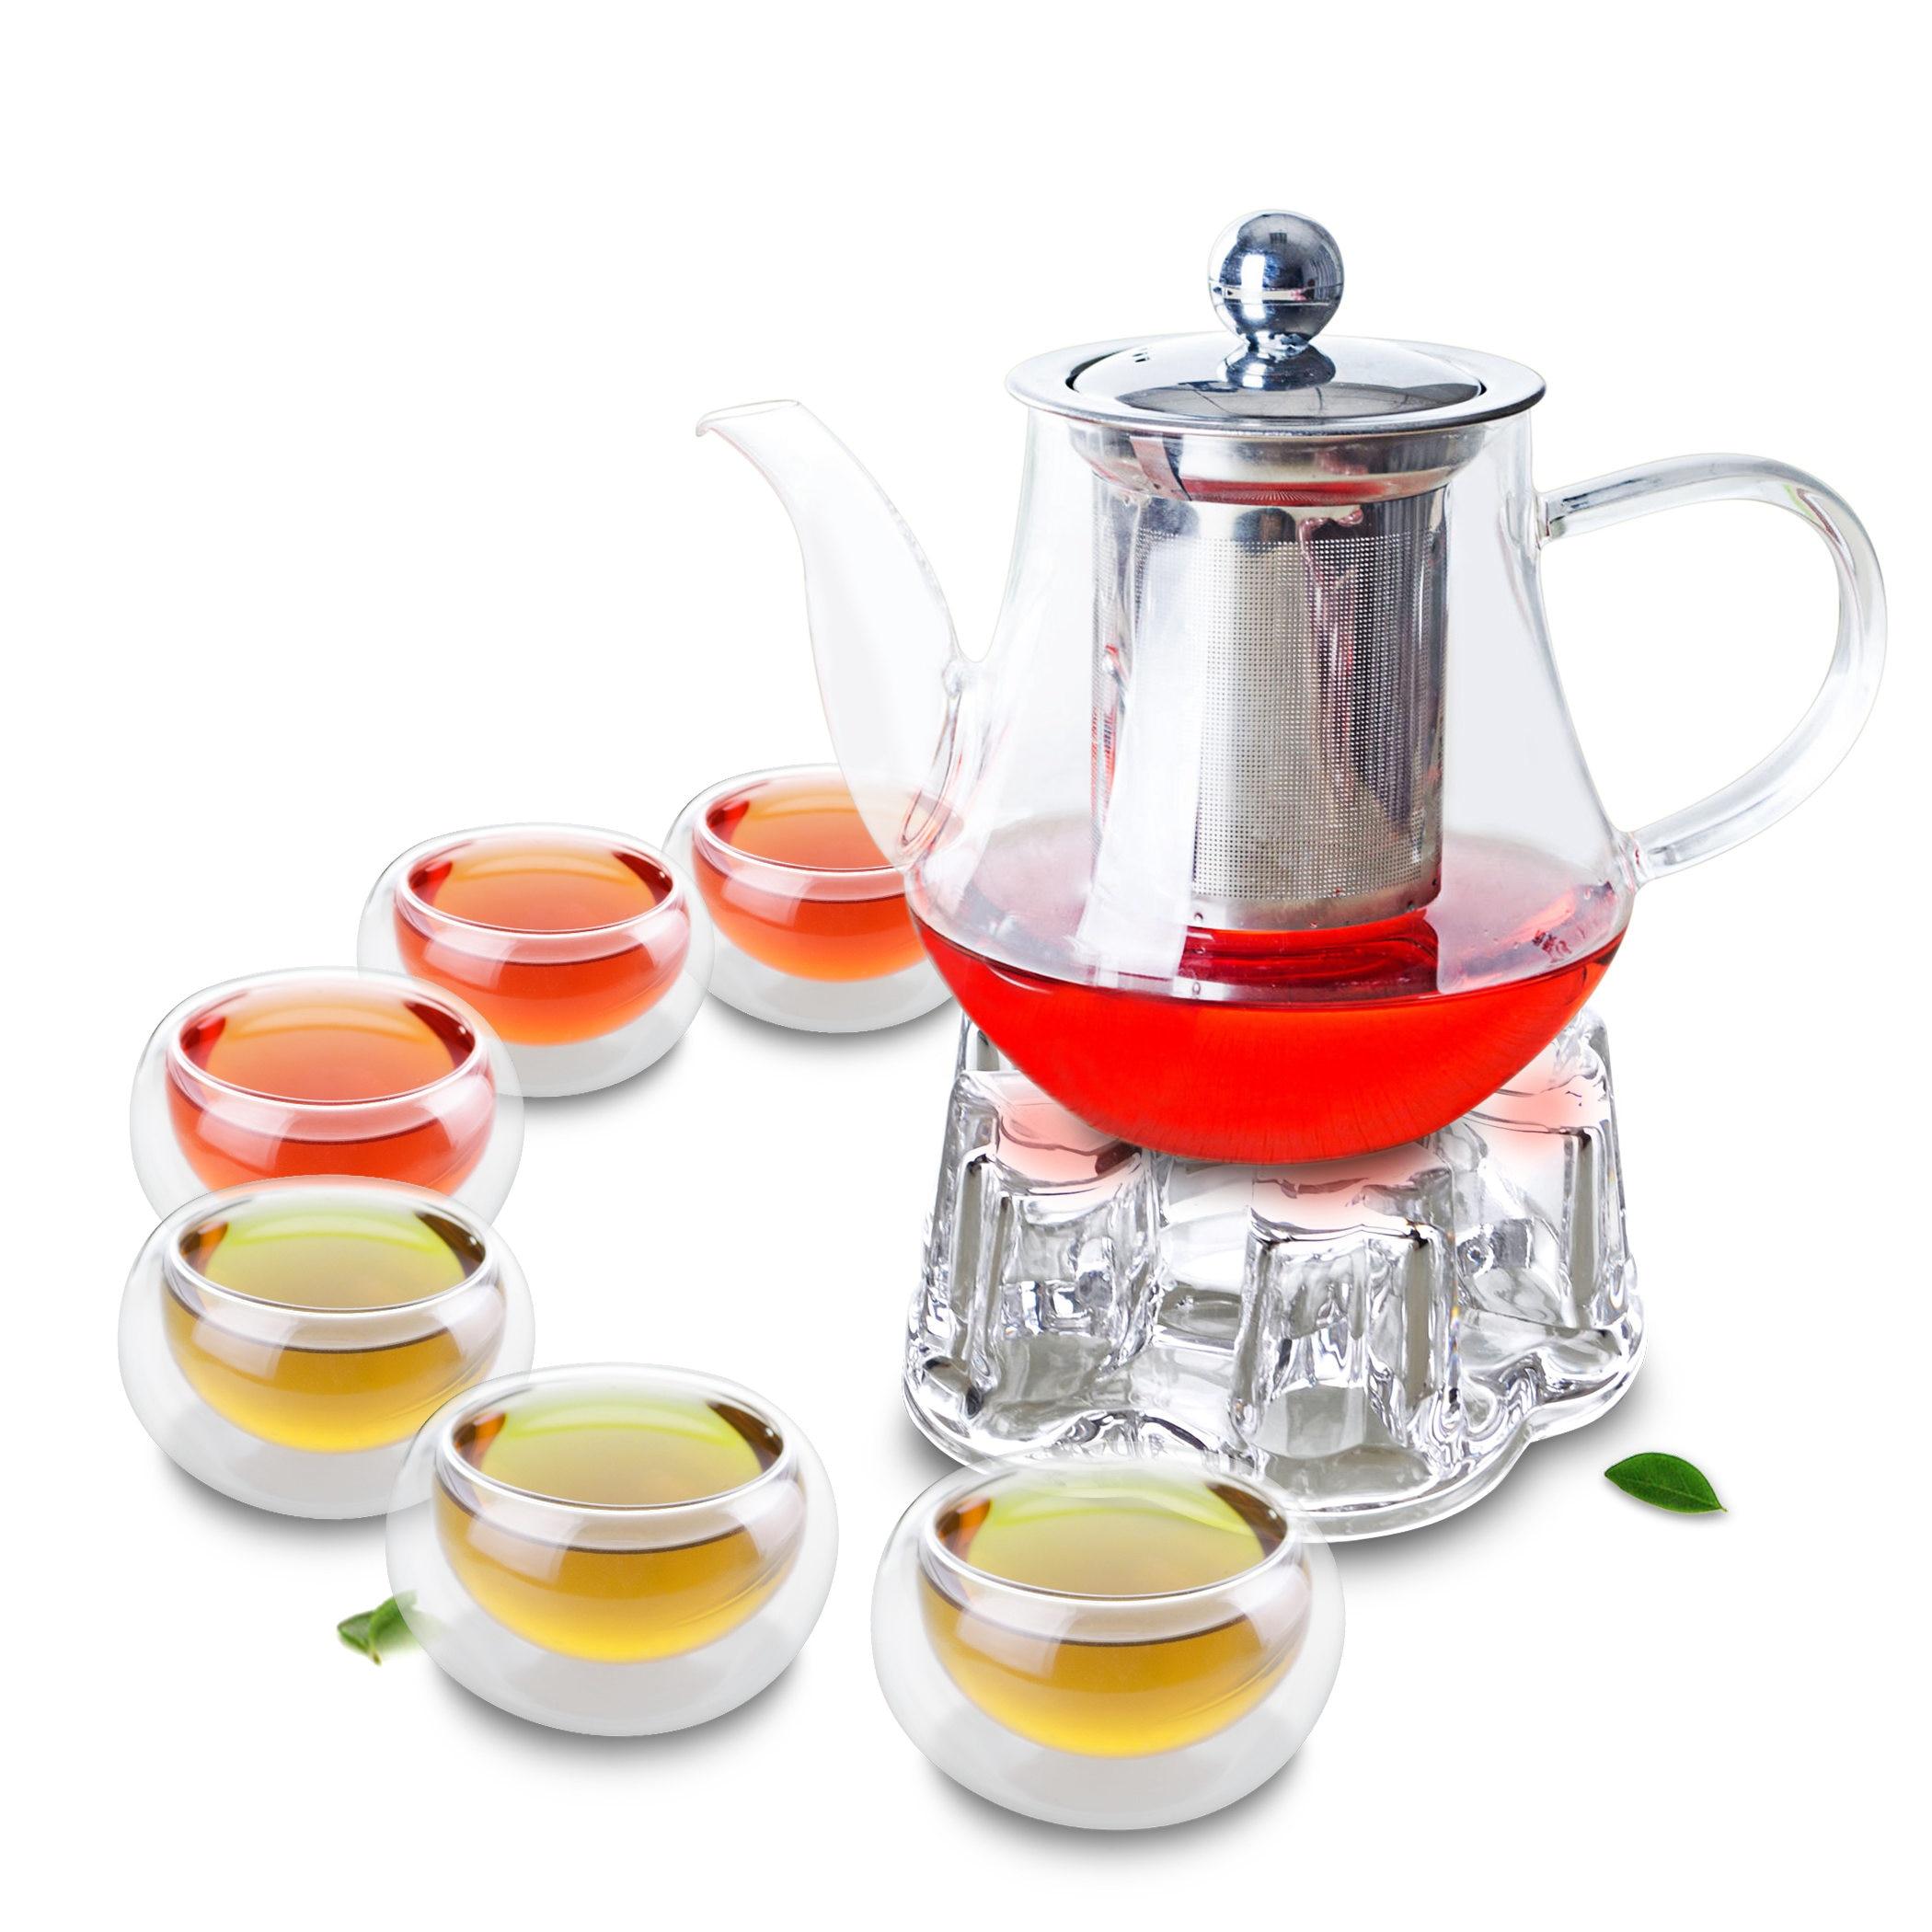 1x 8in1 الكونغ فو القهوة الشاي مجموعة B-Big 565 مللي الزجاج الشاي وعاء ث/الفولاذ المقاوم للصدأ Infuser + الكريستال دفئا B + 6 * مزدوجة الجدار طبقة أكواب